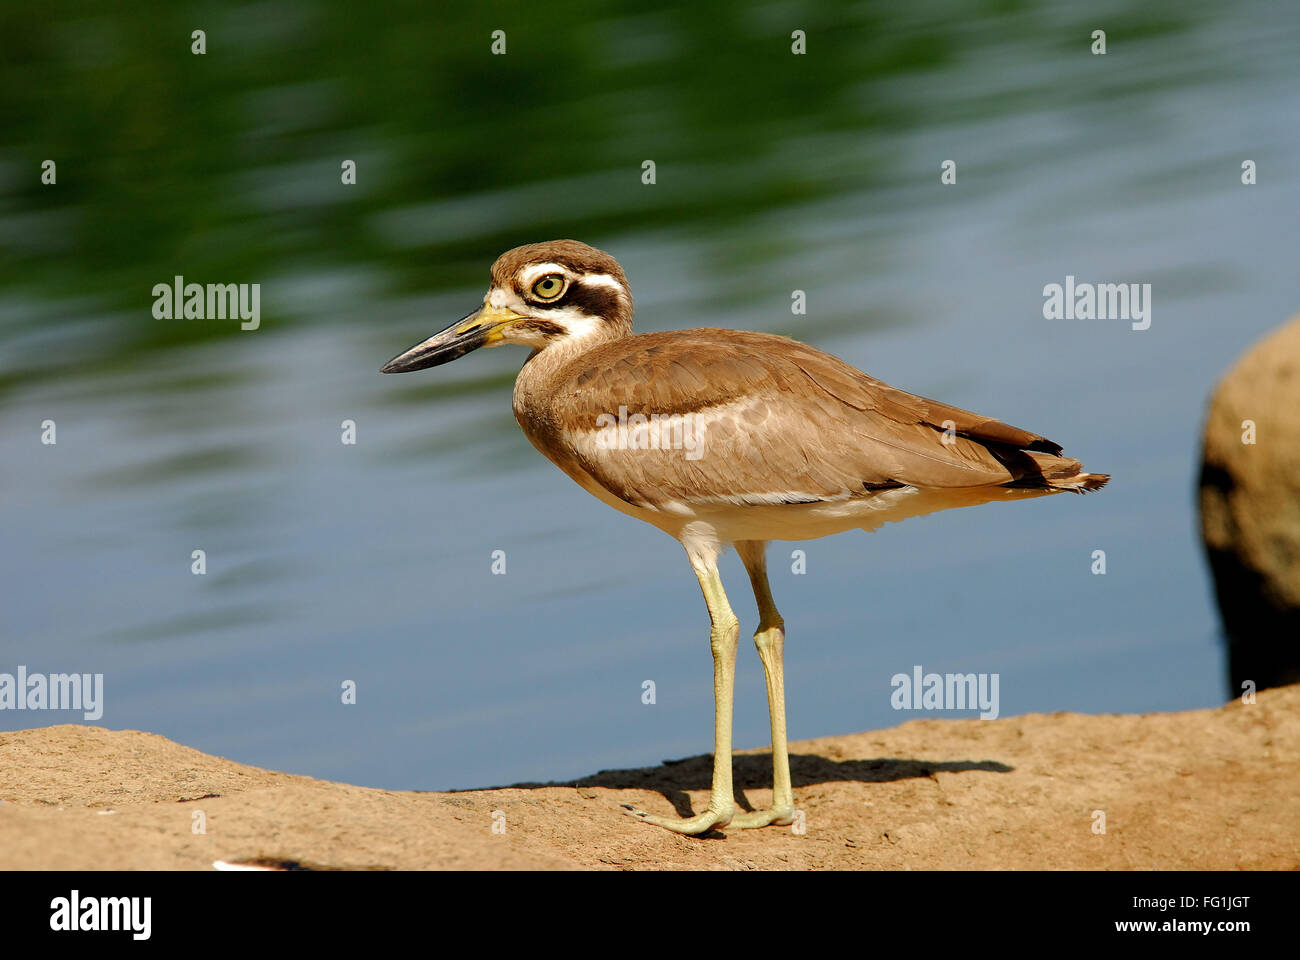 Birds , Stone Plover Esacus recurvirostris - Stock Image